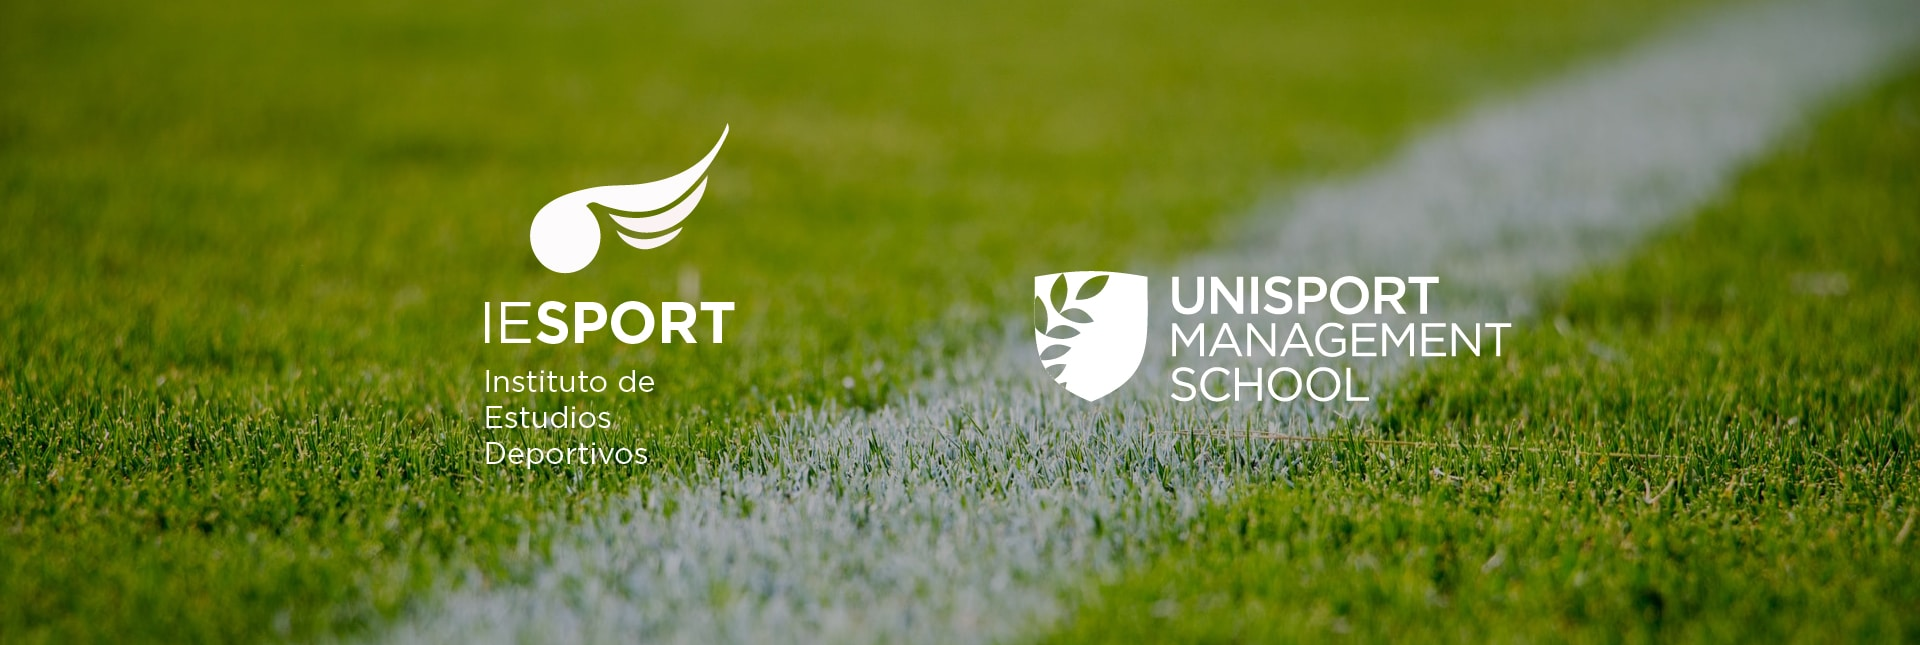 Iesport ha sido adquirida por Unisport